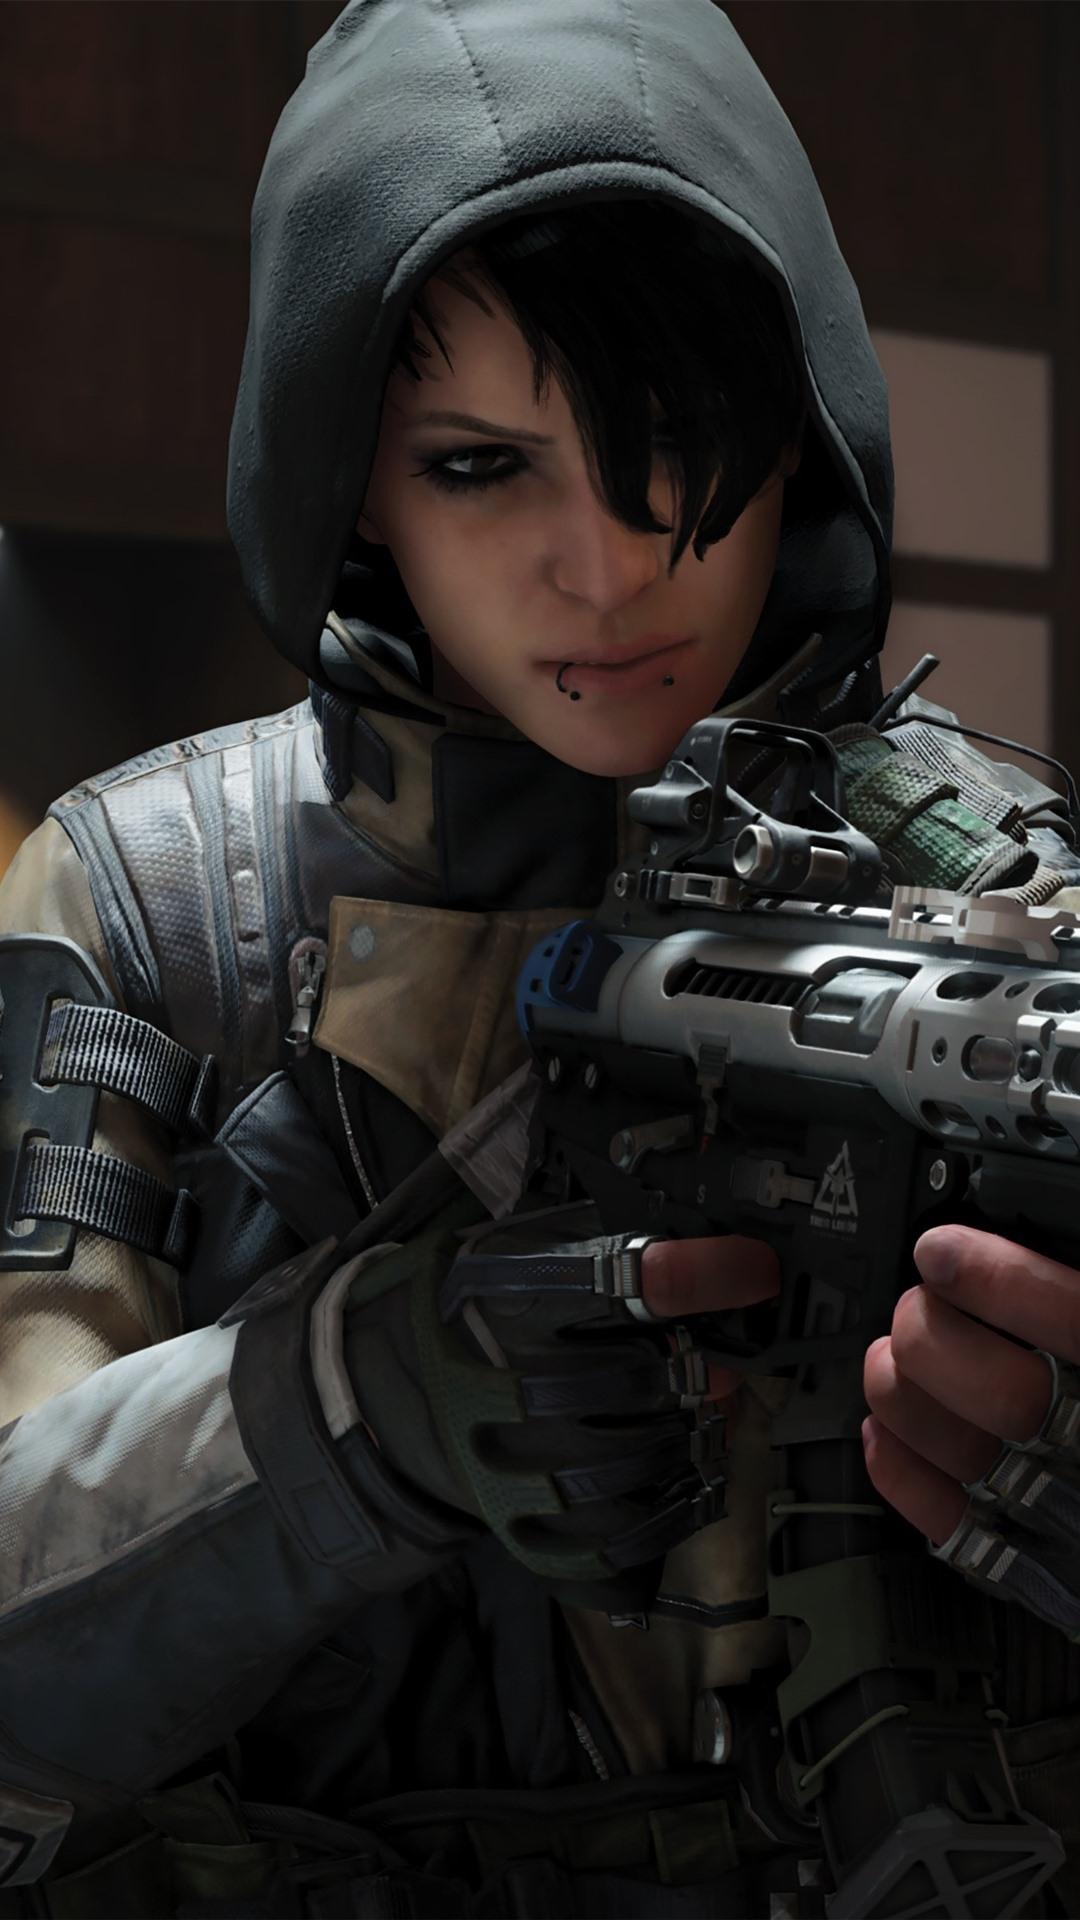 Cod Black Ops 4 Zero - HD Wallpaper